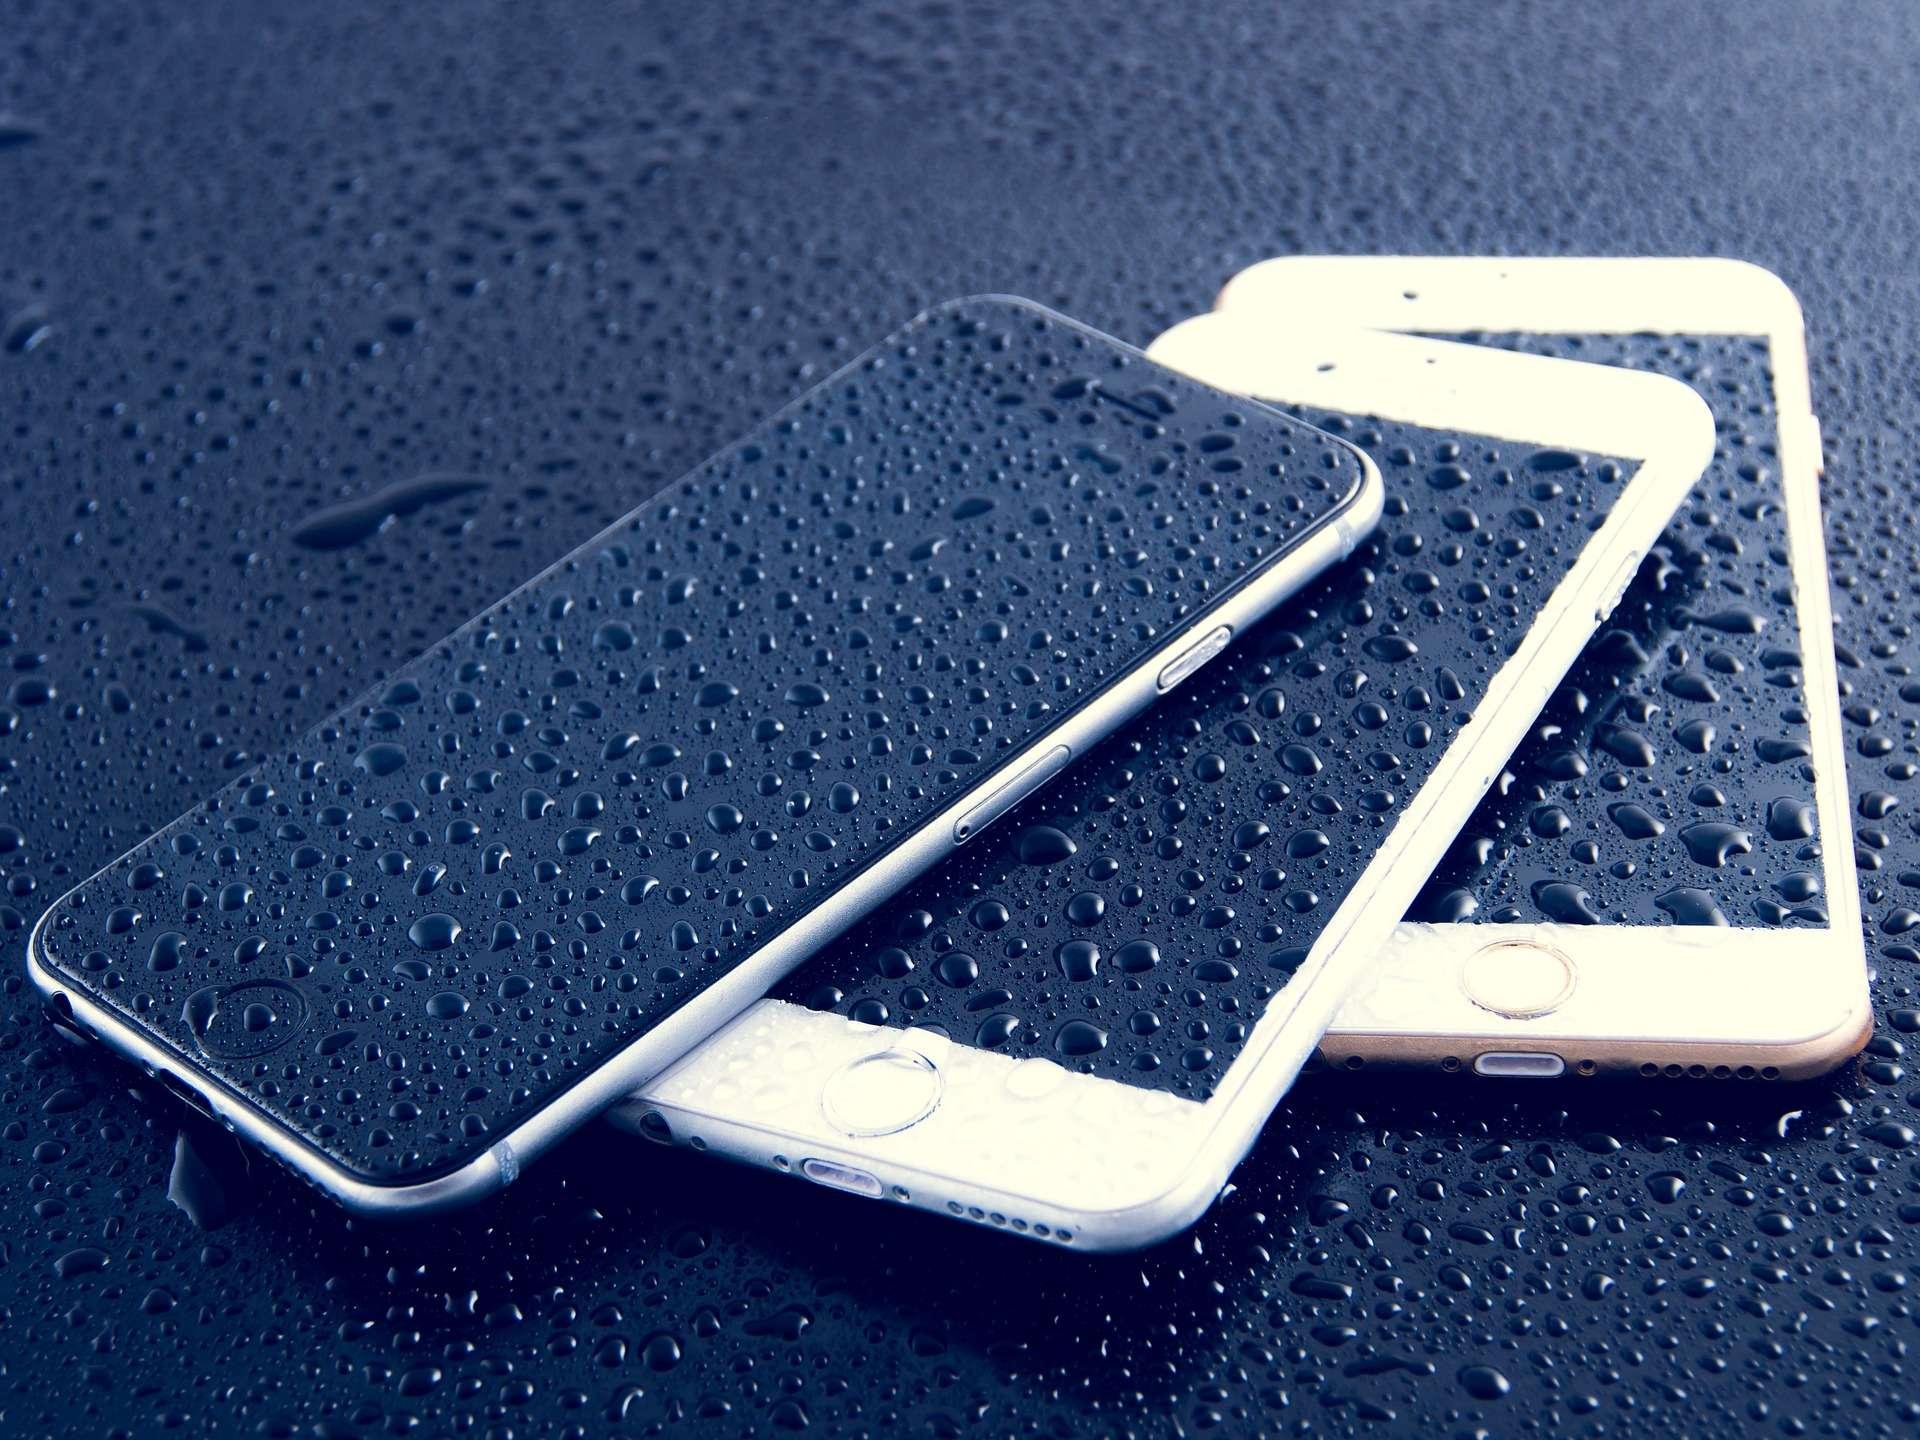 iPhone rain by Dariusz Sankowski encryption 100+ organizations and individuals back Apple vs FBI